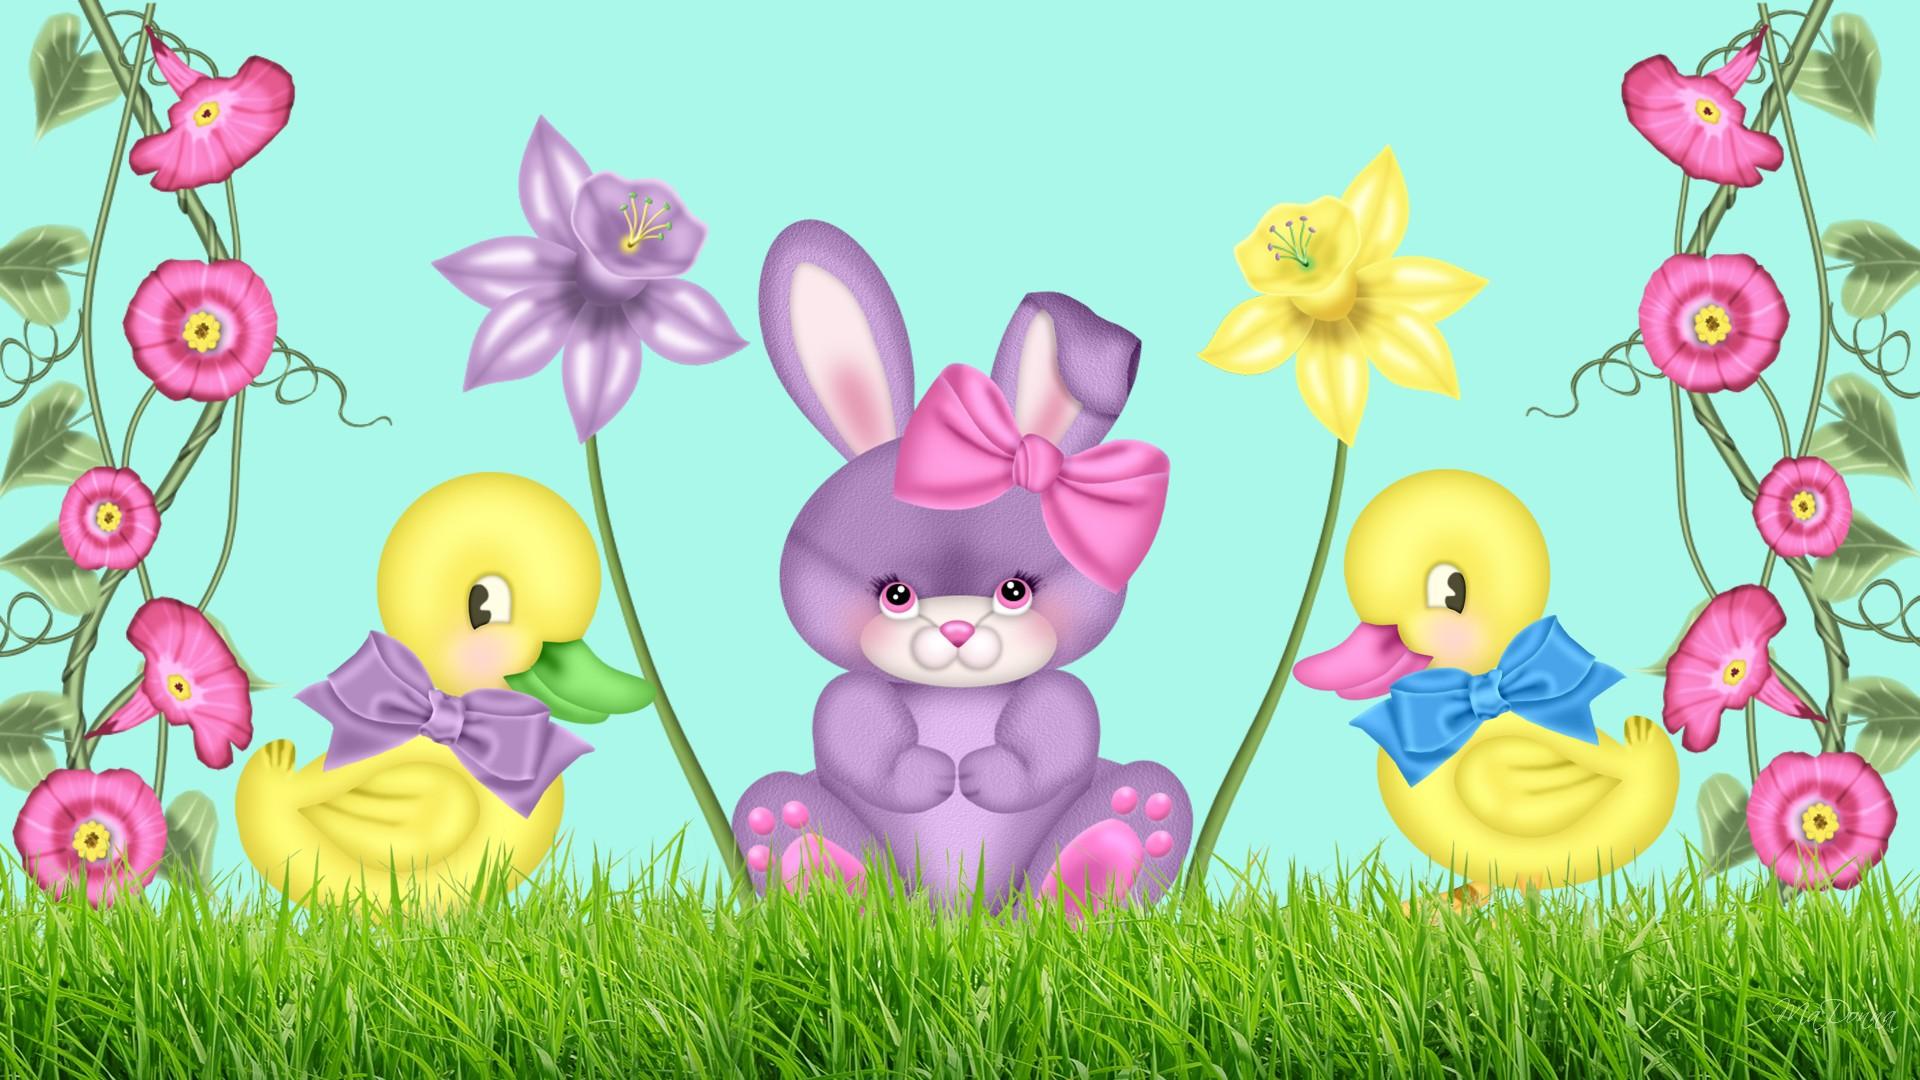 Free Download Easter Wallpaper Desktop Wallpaper 1382315